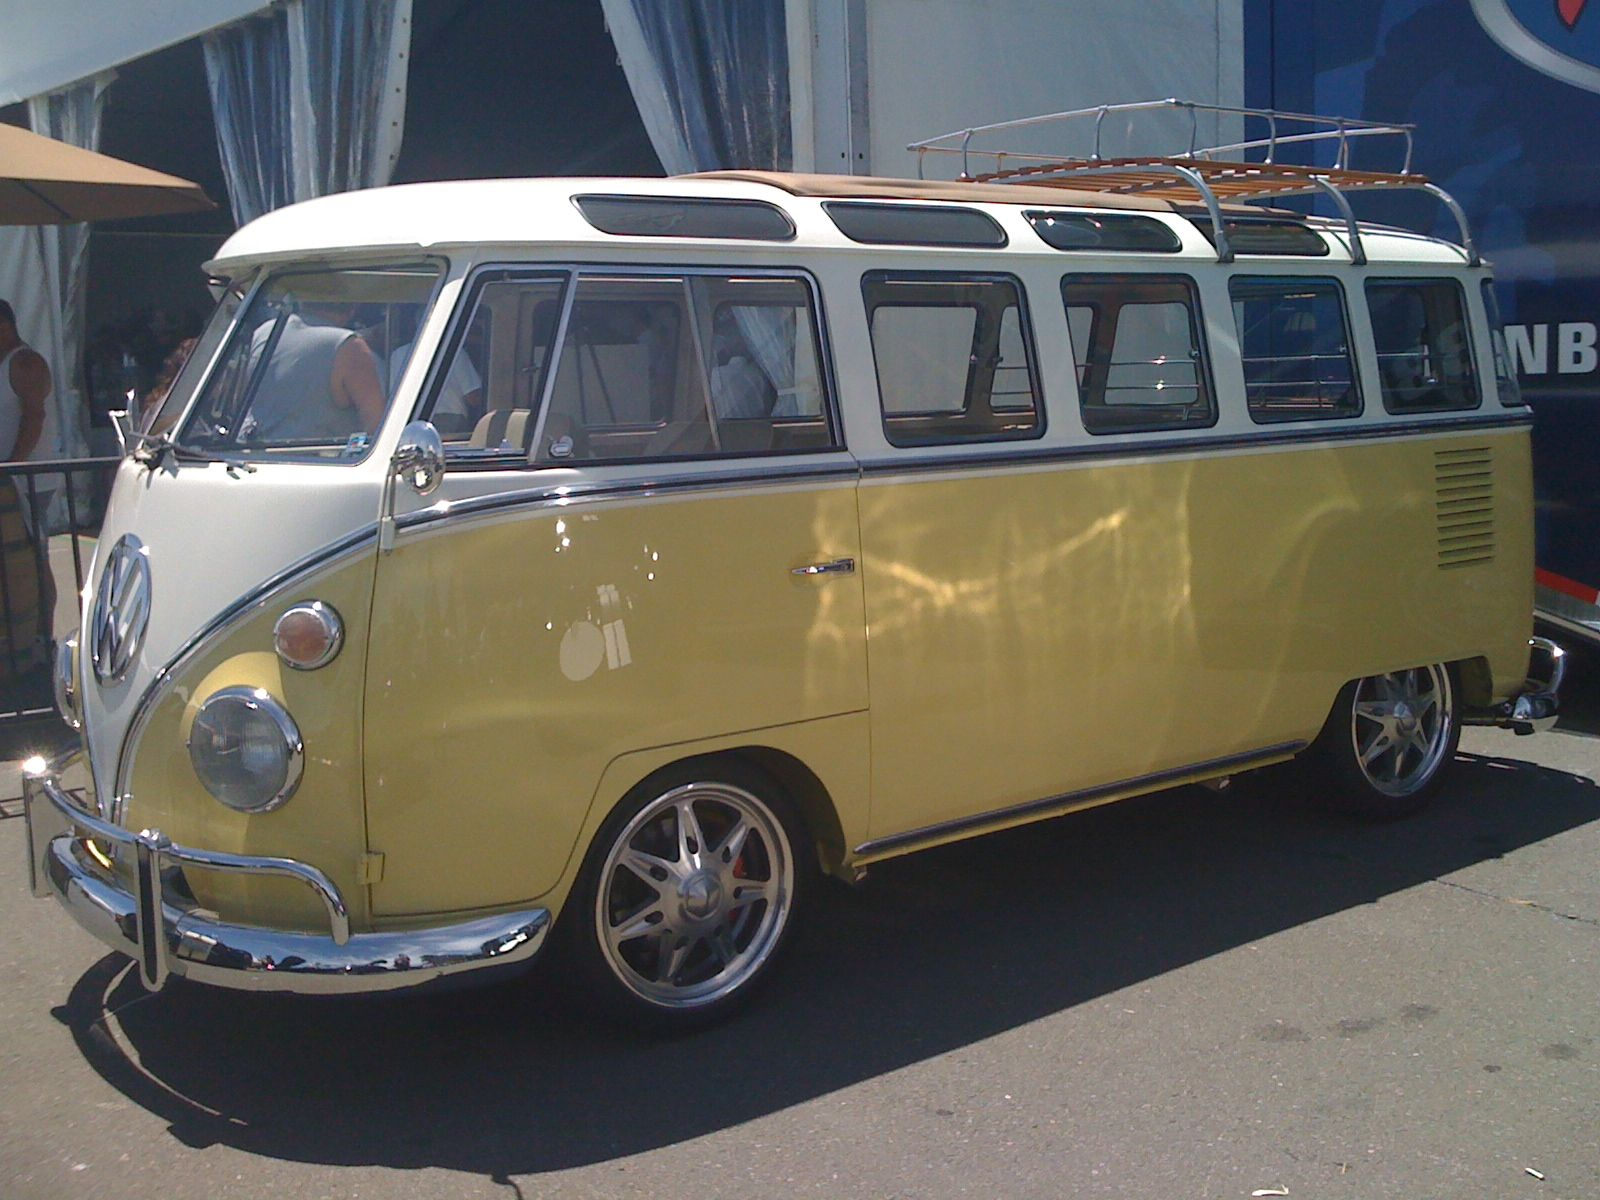 White & Yellow VW Bus 23 Window 2nd Gen. Vw samba bus